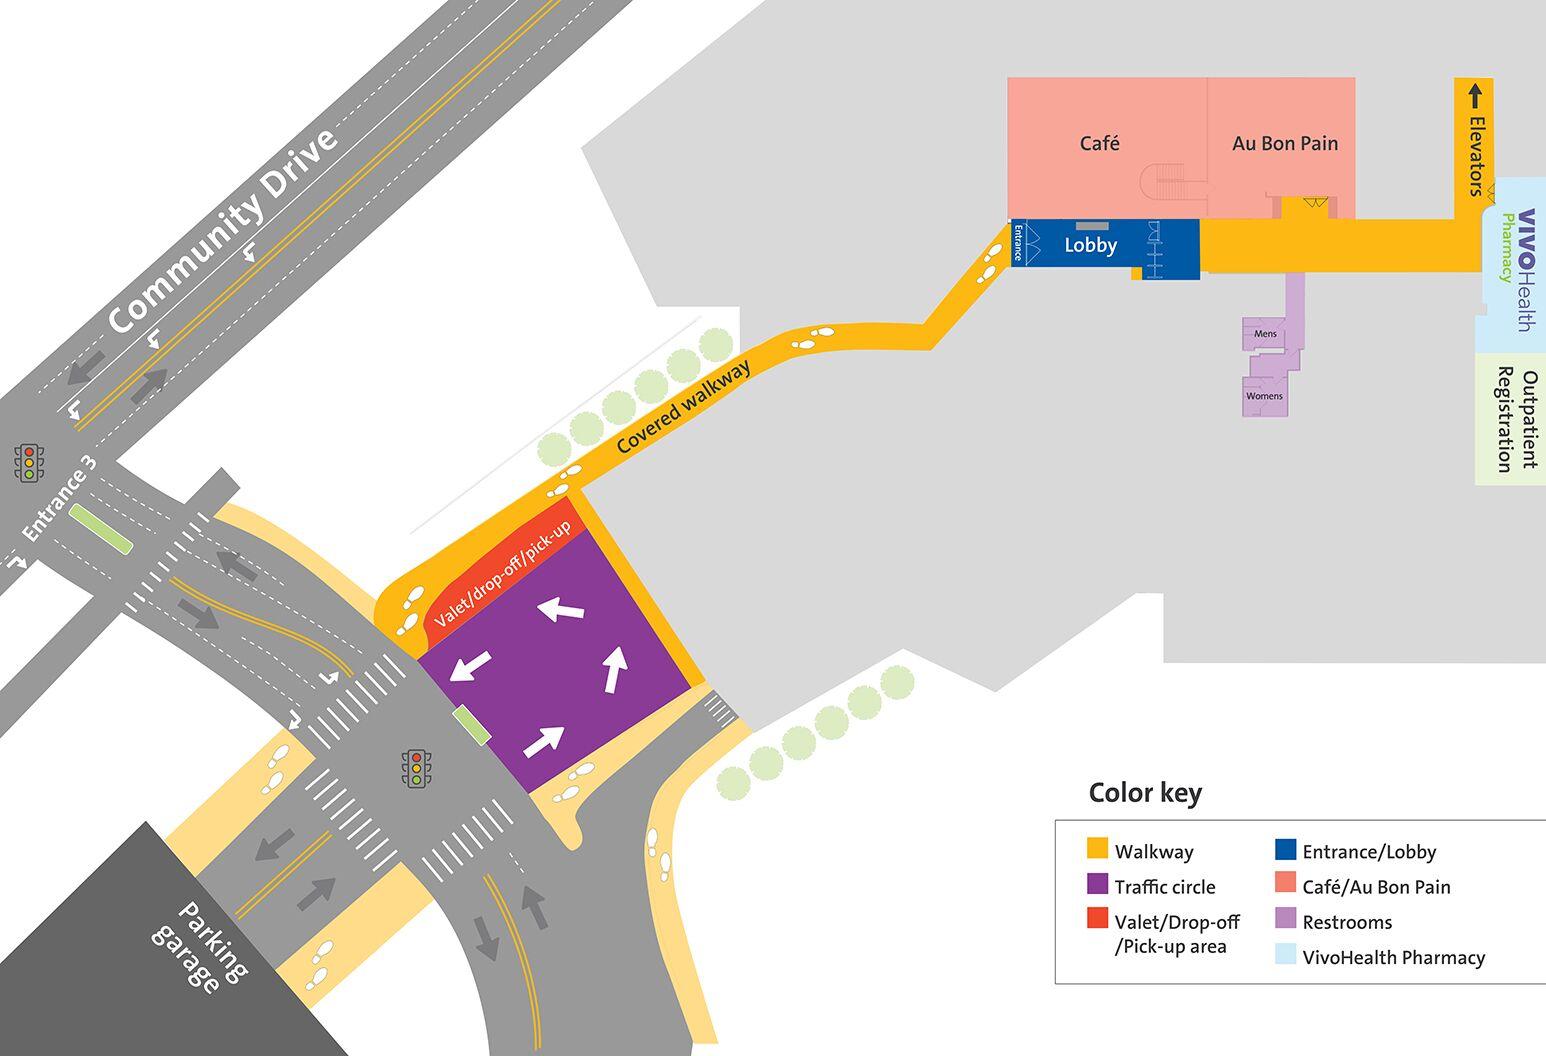 Main entrance walkway, valet, drop-off and pick-up areas at North Shore University Hospital.